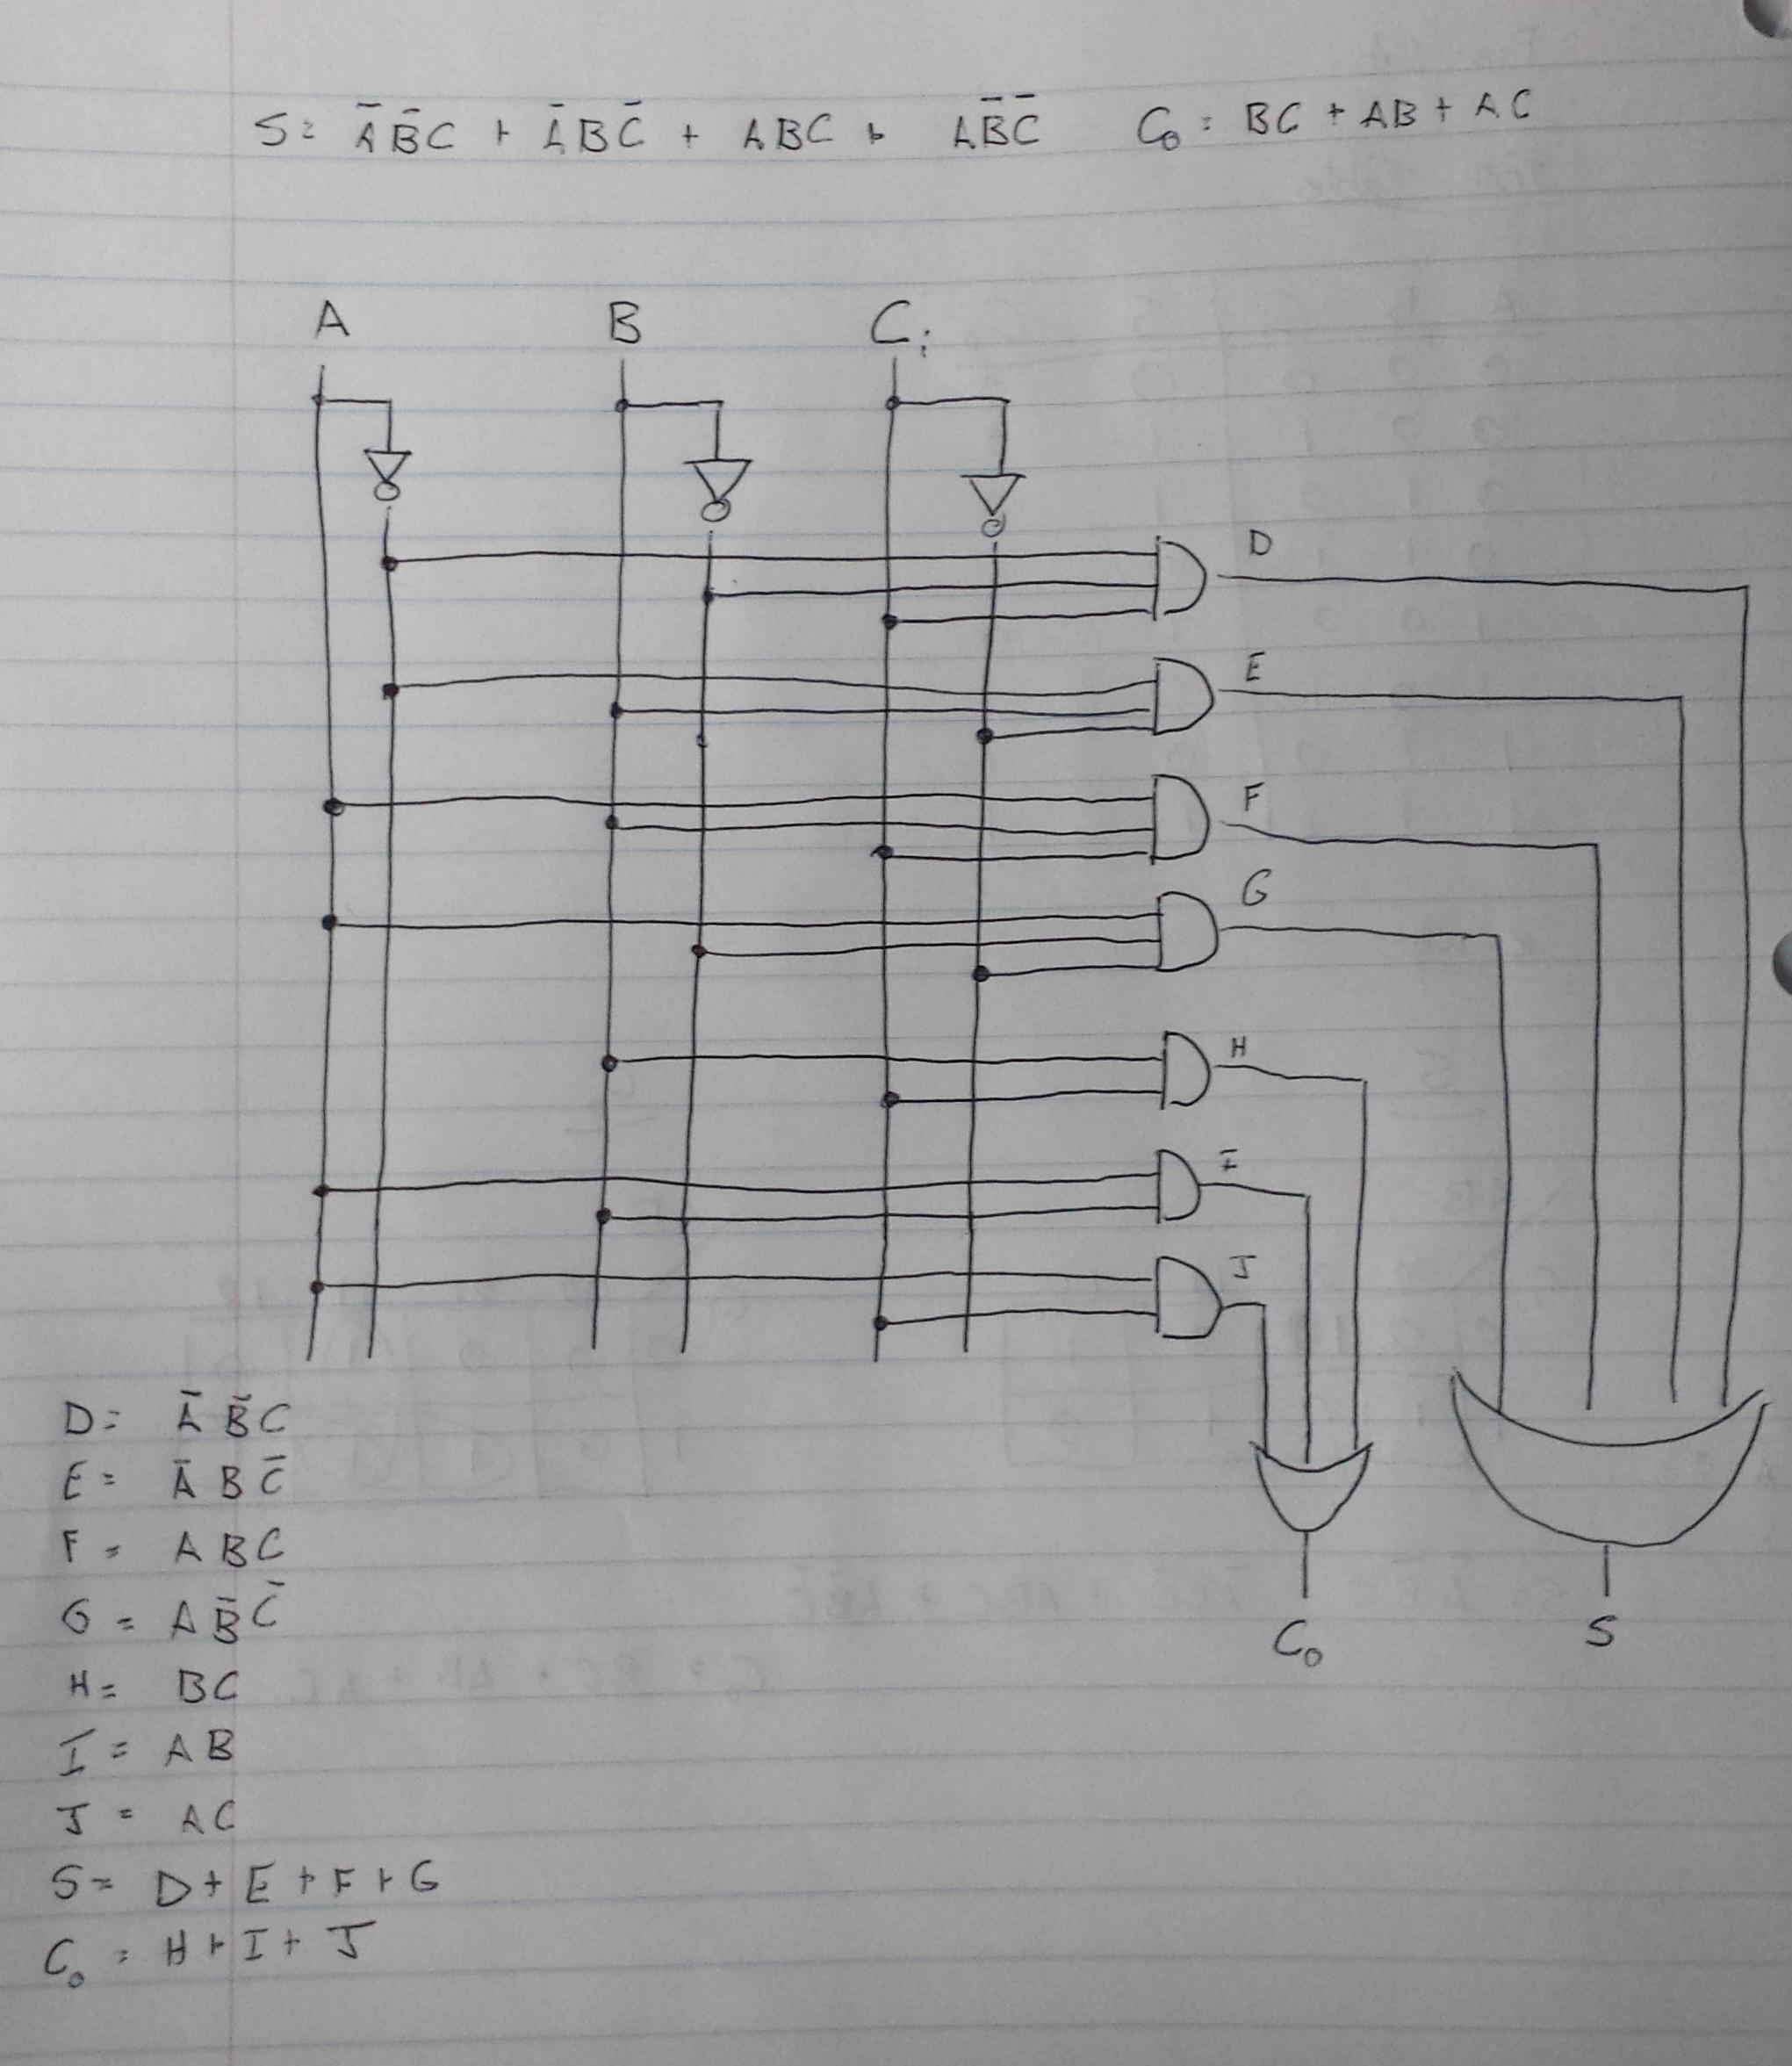 Ece281 Lab2 Readmemd At Master Chrismkiernan Github 4 Bit Adder Logic Diagram Schematic